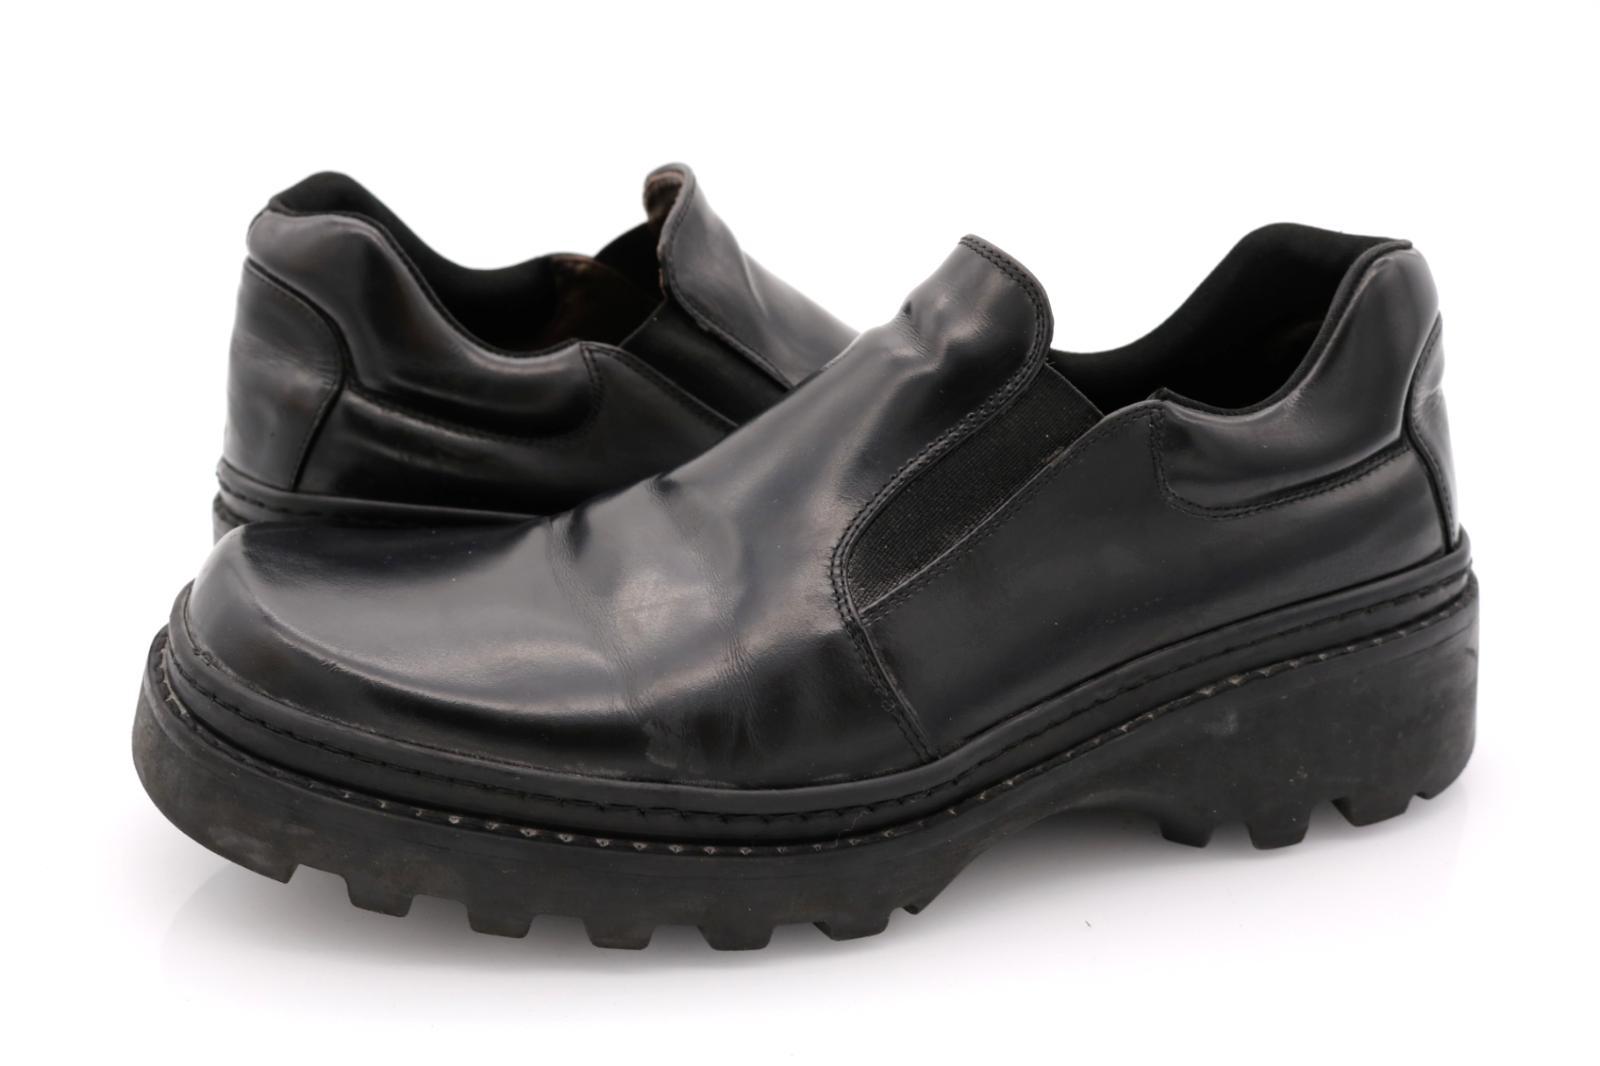 Kenneth Cole New York Mens 7.5 Black Leather Slip On Dress Shoes EUR 41.5